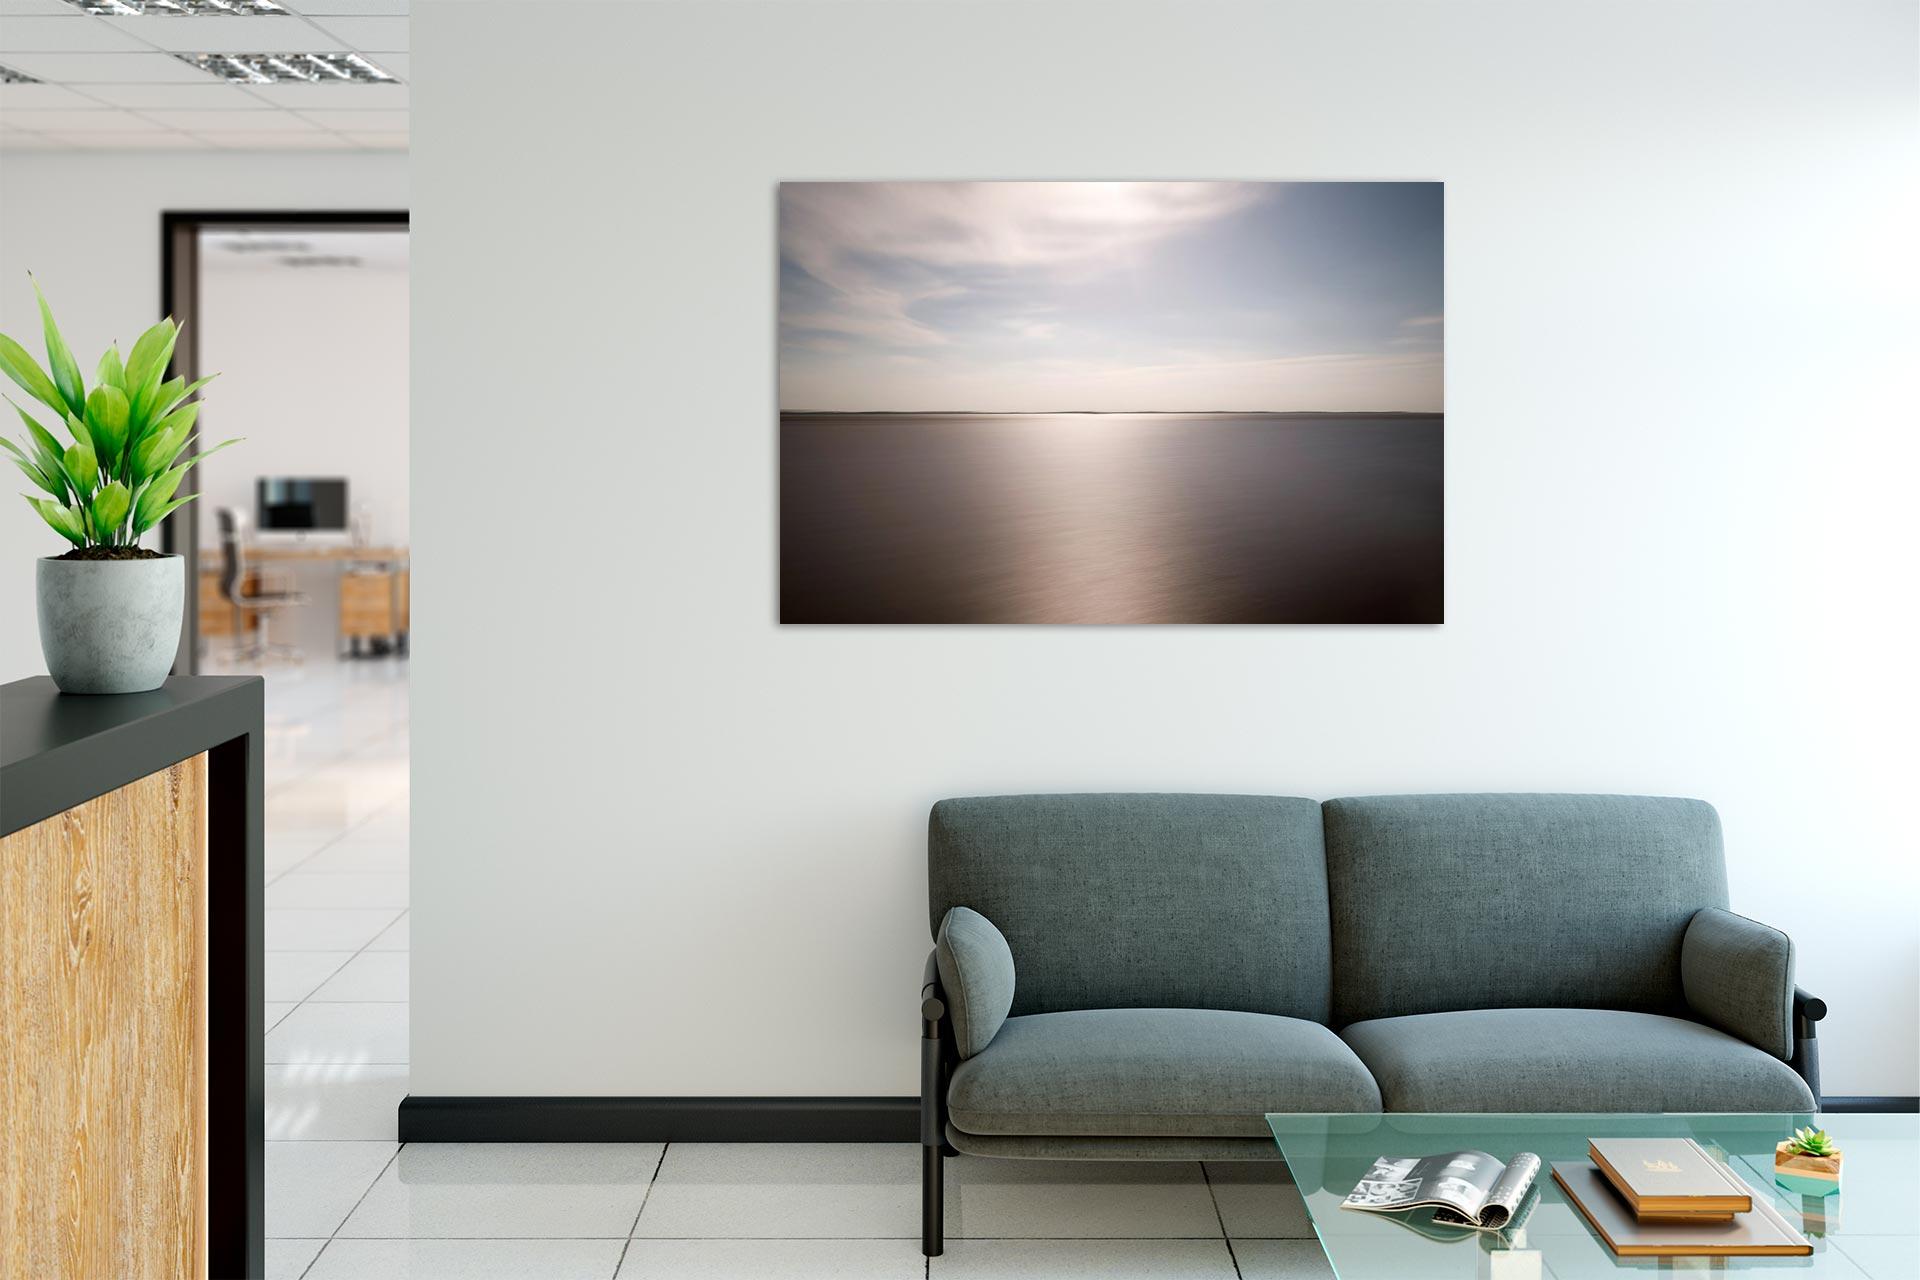 LCW200-elbe-wischhafen-wandbild-bild-auf-leinwand-acrylglas-aludibond-empfang